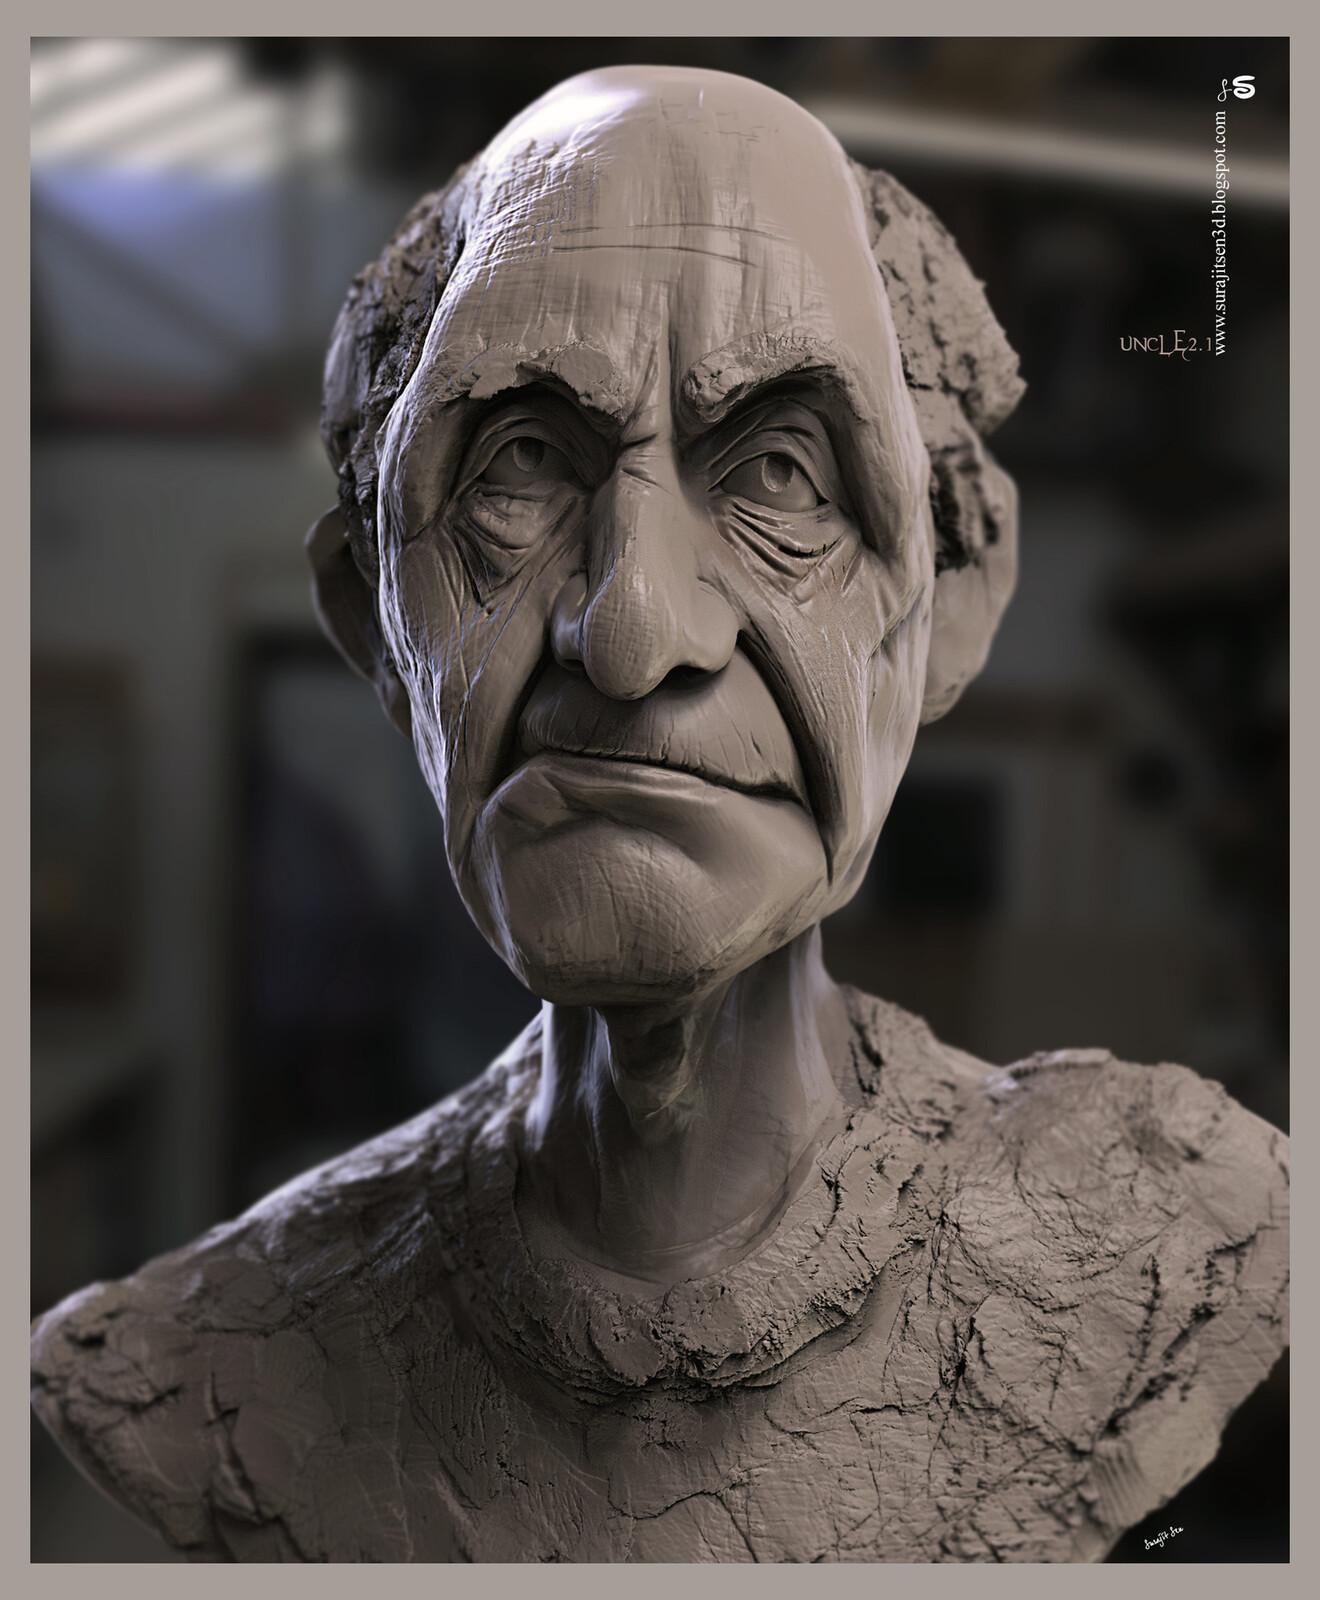 #todaystudy #todayssculpture uncle2.1 Digital Sculpture Quick Sculpting Study works Background music- #hanszimmermusic